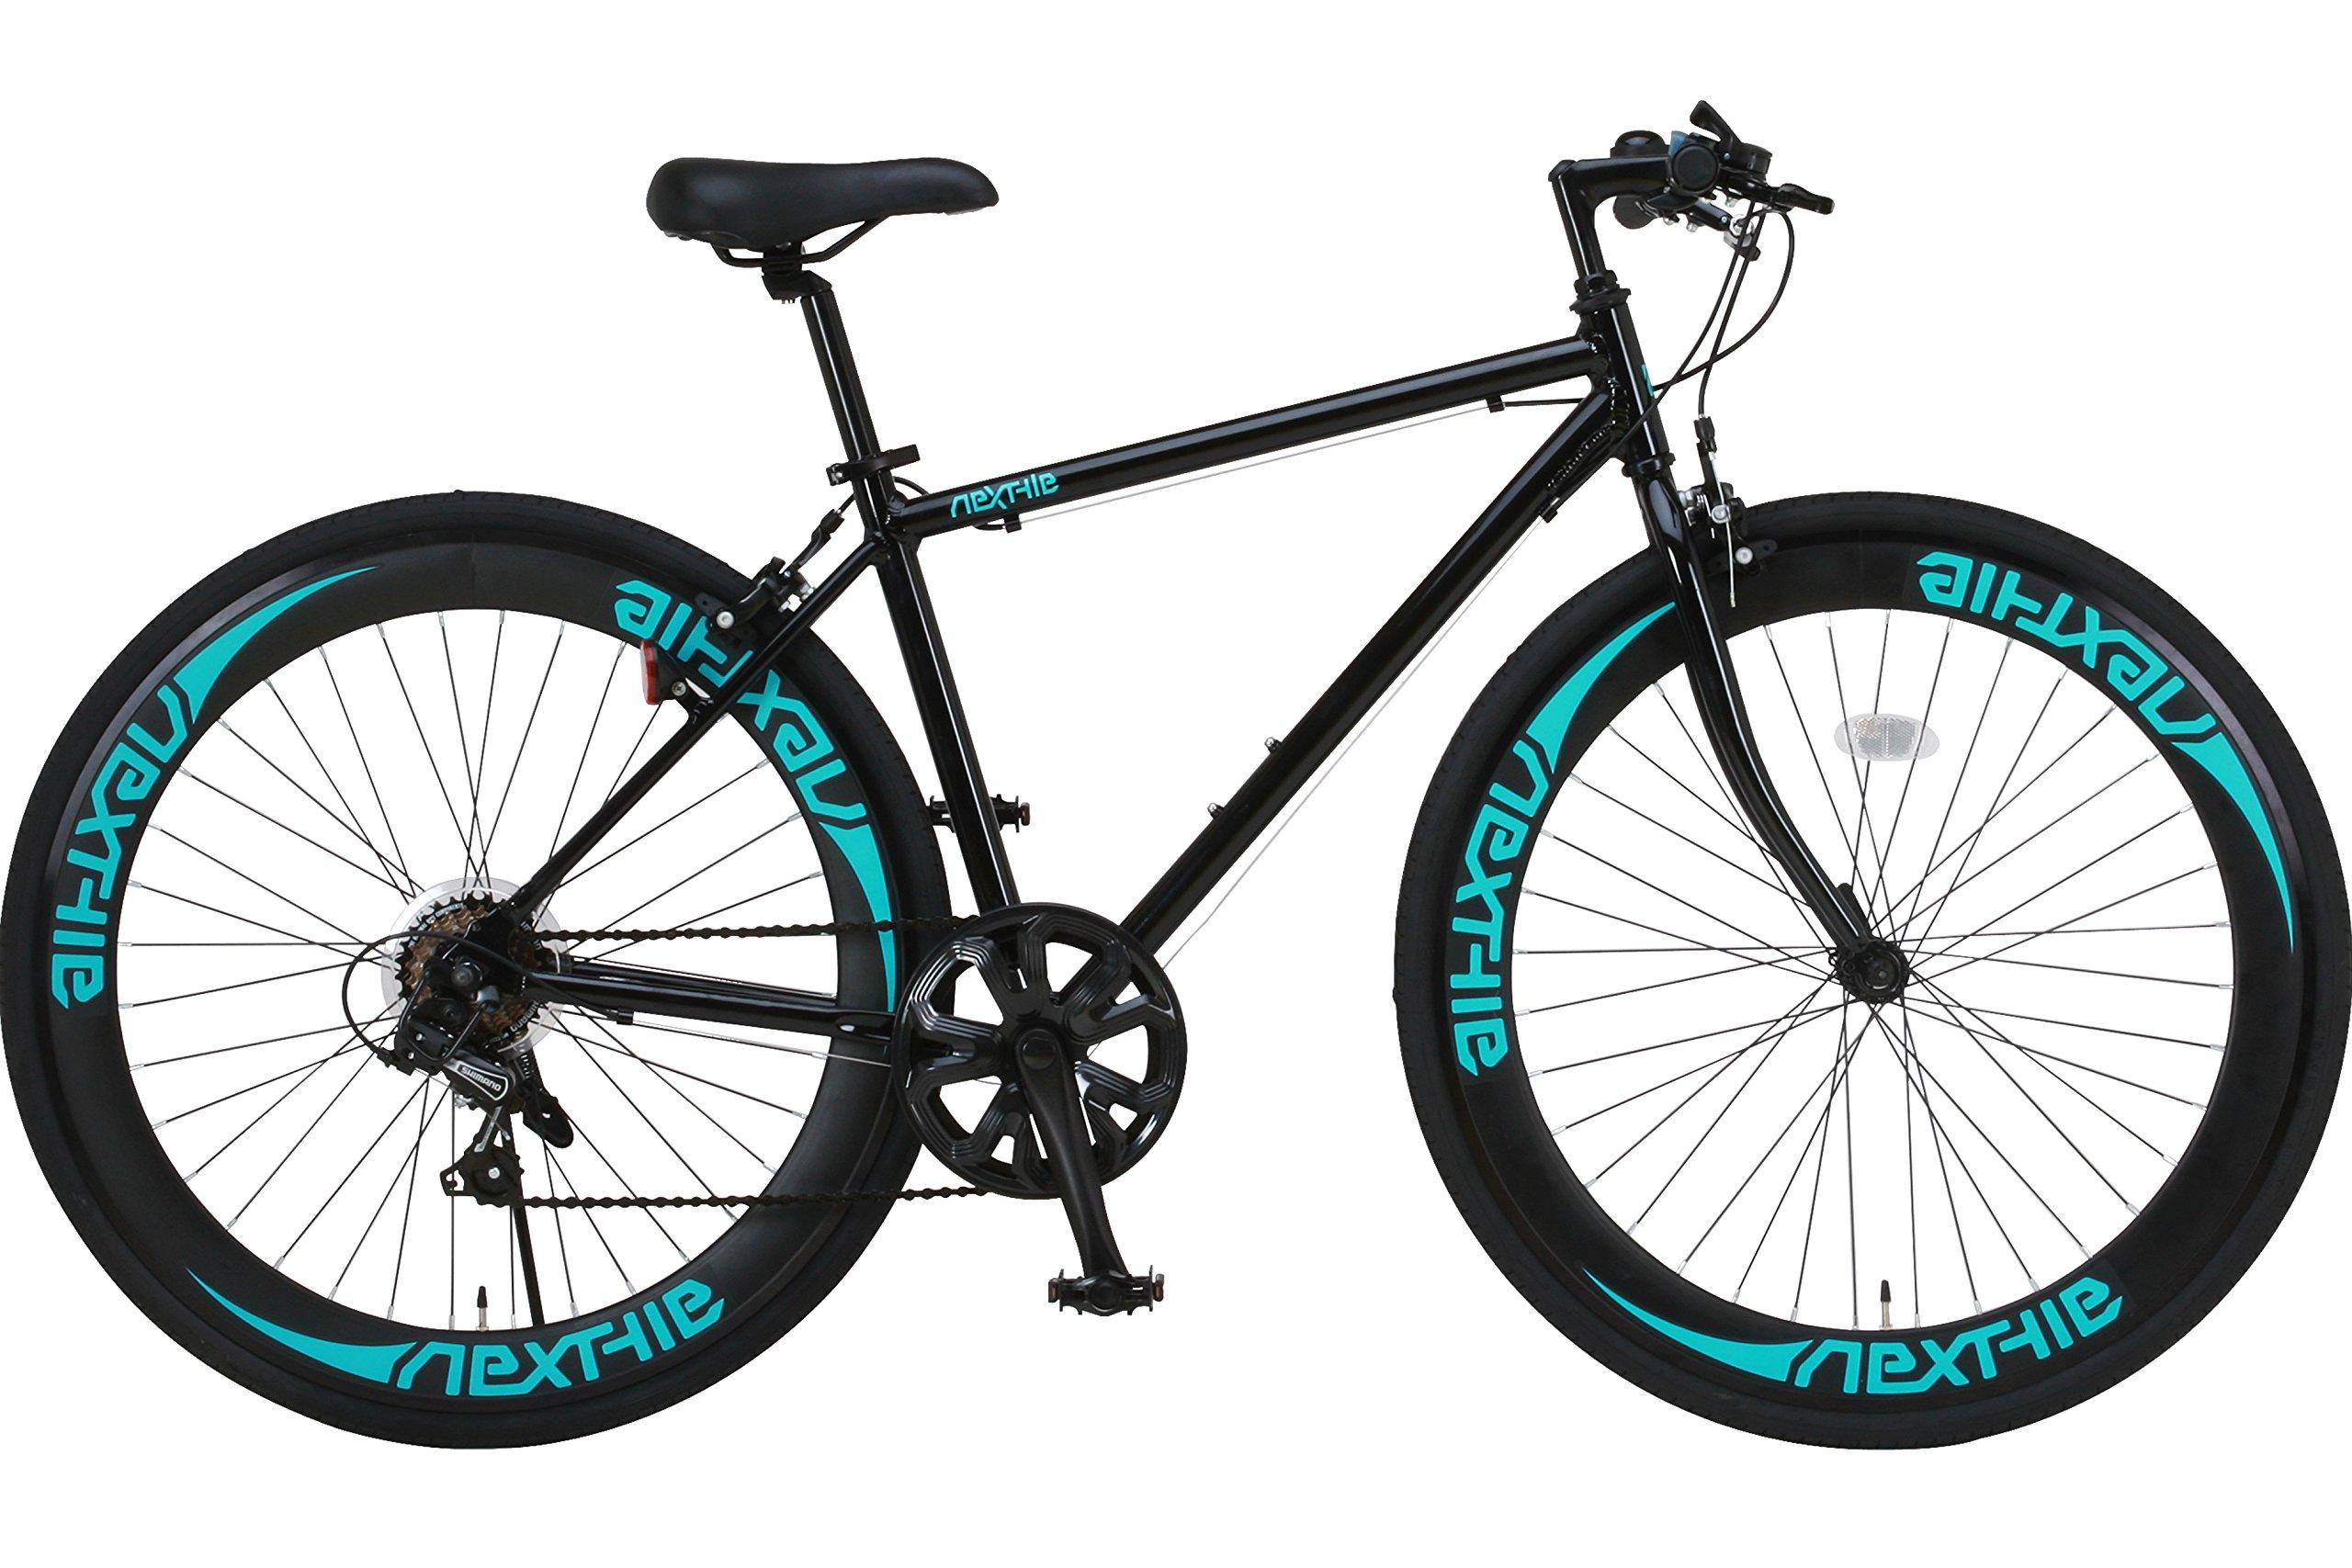 otomo(オオトモ) NEXTYLE (ネクスタイル)700Cクロスバイク アルミフレーム シマノ7段変速 ディープリム 前輪クリックリリース CNX-7006-GN(ブラック/グリーン)